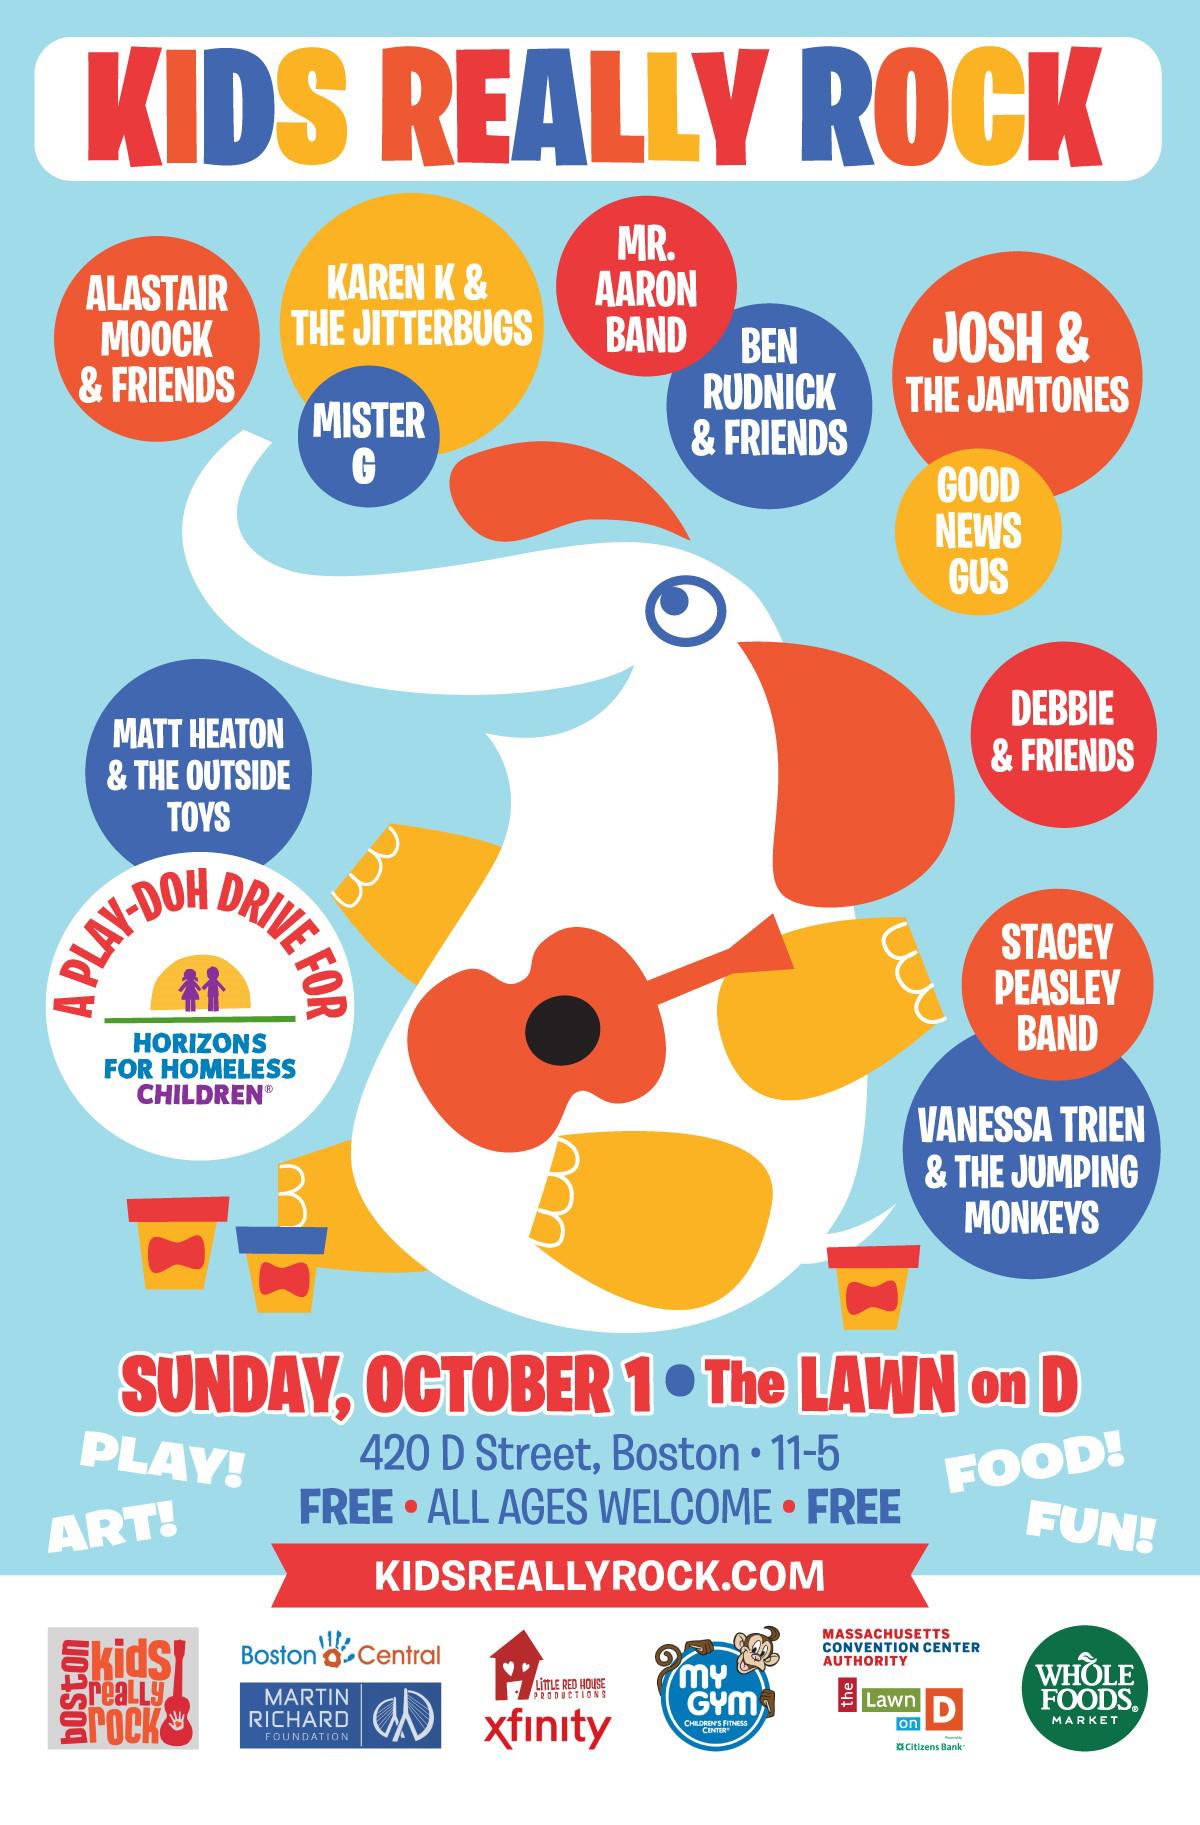 Kids Really Rock Celebrates 5th Annual Boston Family Festival